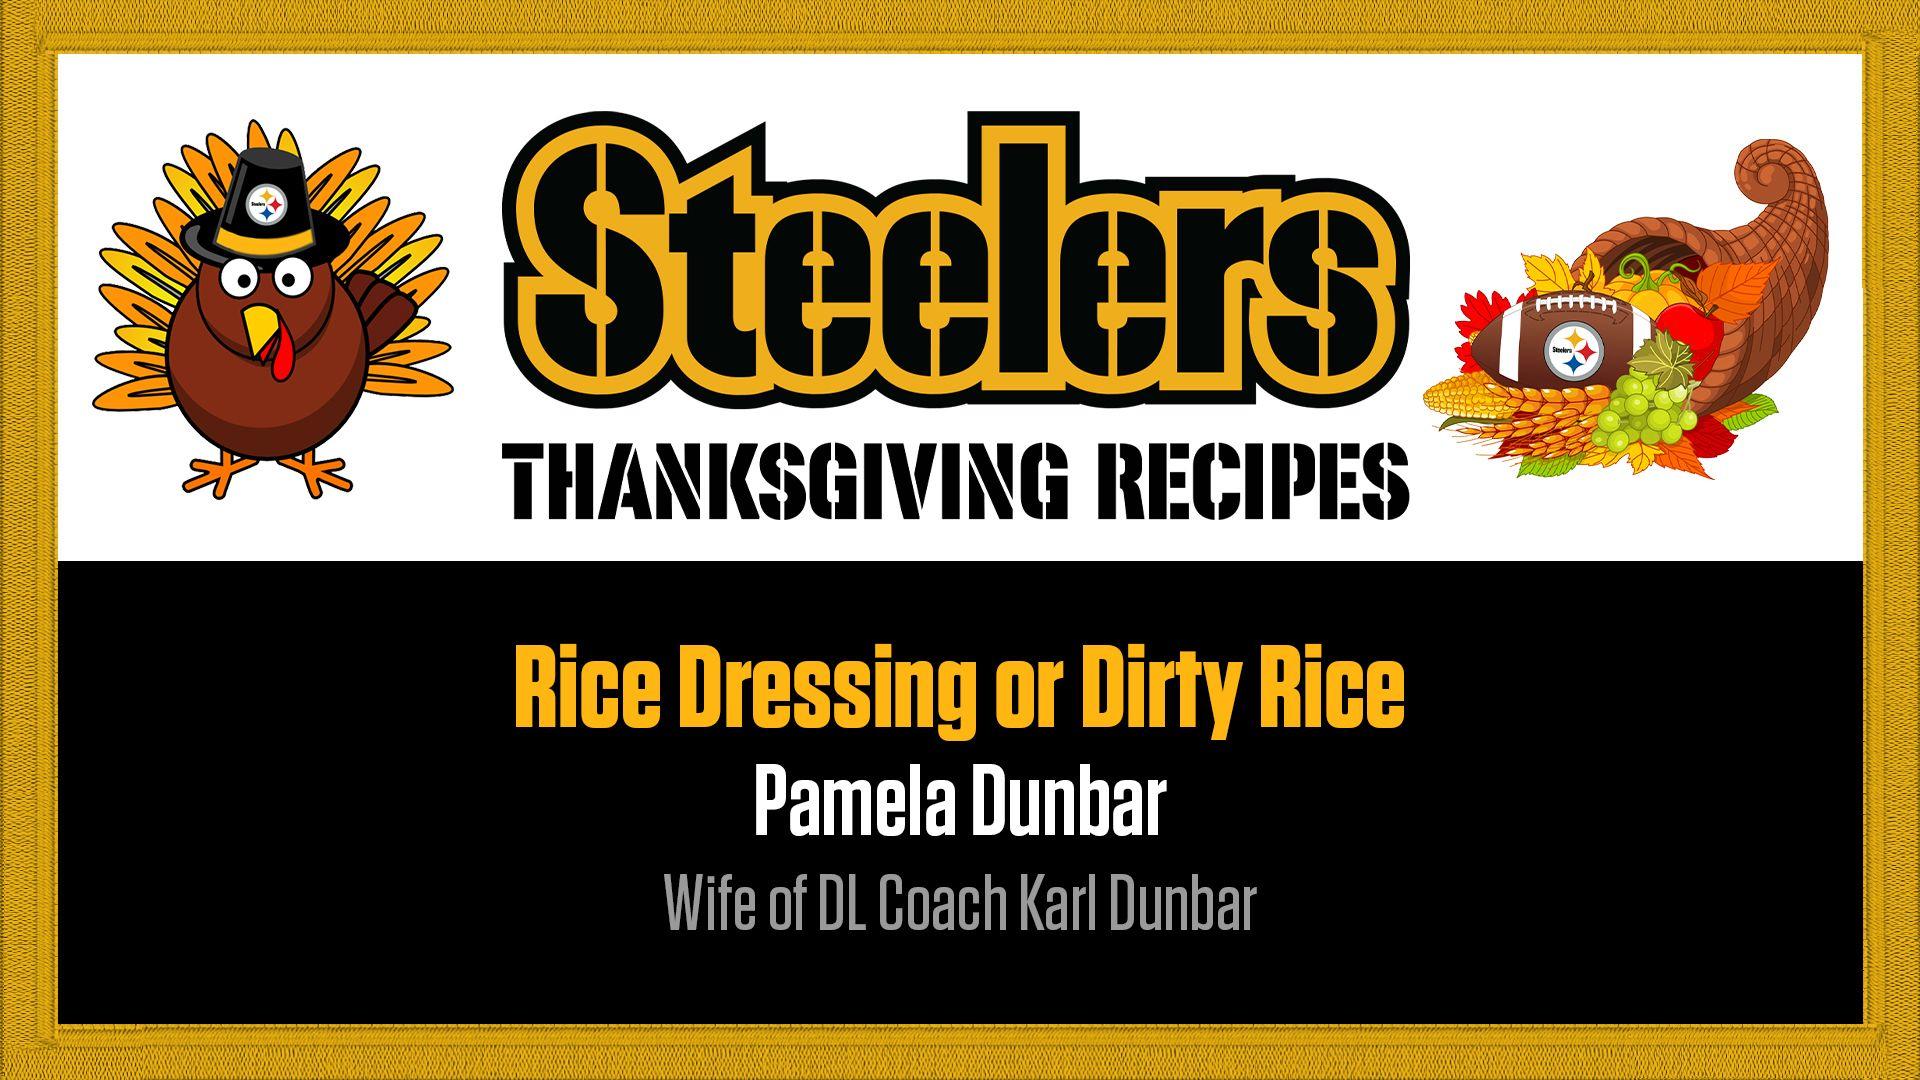 Recipe - rice dressing_pamela dunbar